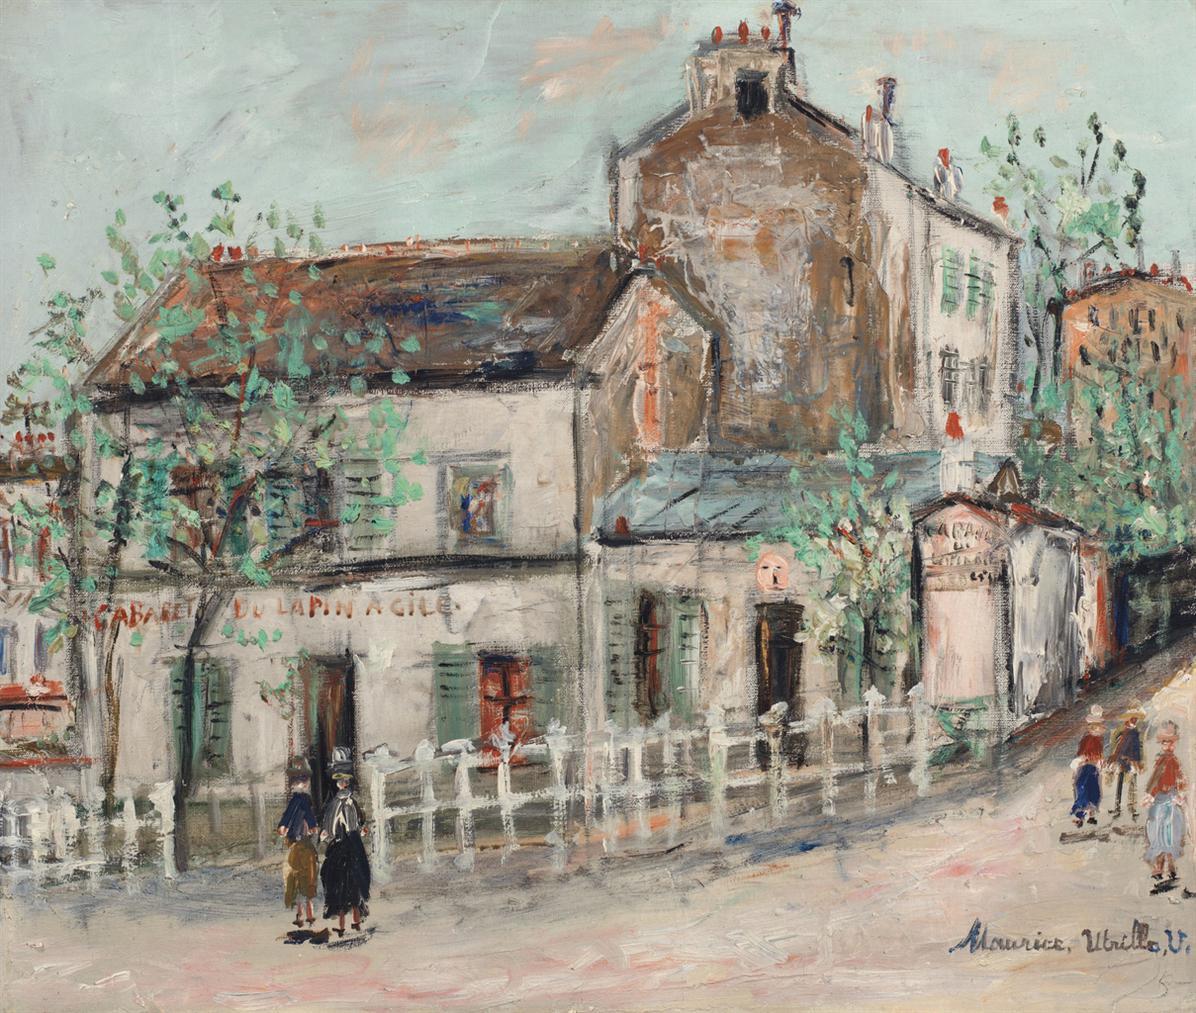 Maurice Utrillo-Cabaret Du Lapin Agile-